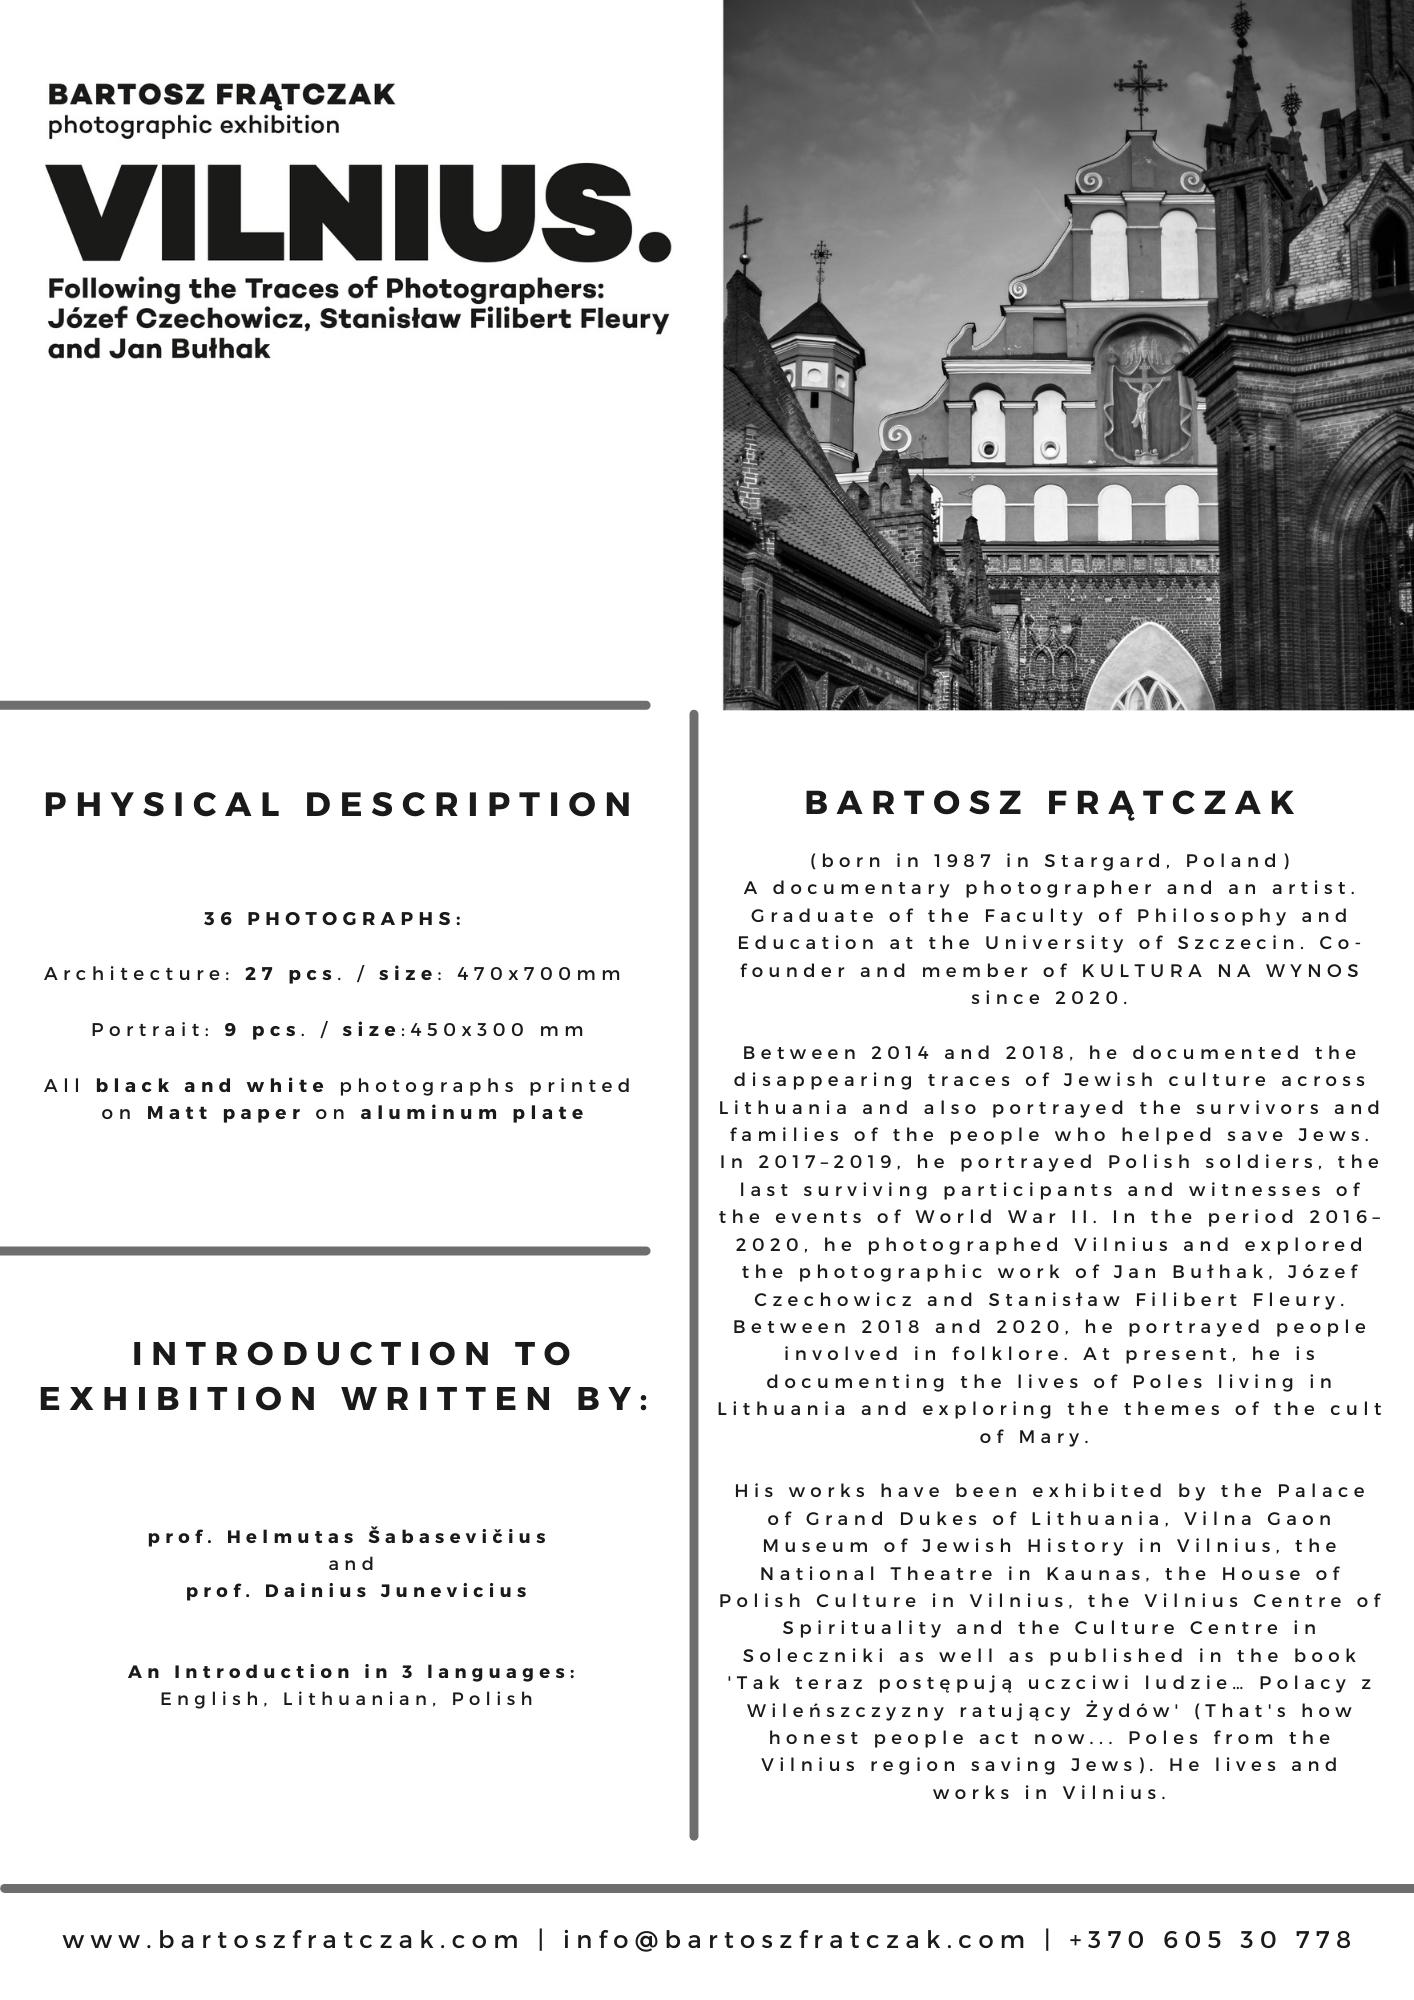 Vilnius. Following the Traces of the Photographers: Józef Czechowicz, Stanisław Filibert Fleury and Jan Bułhak 1